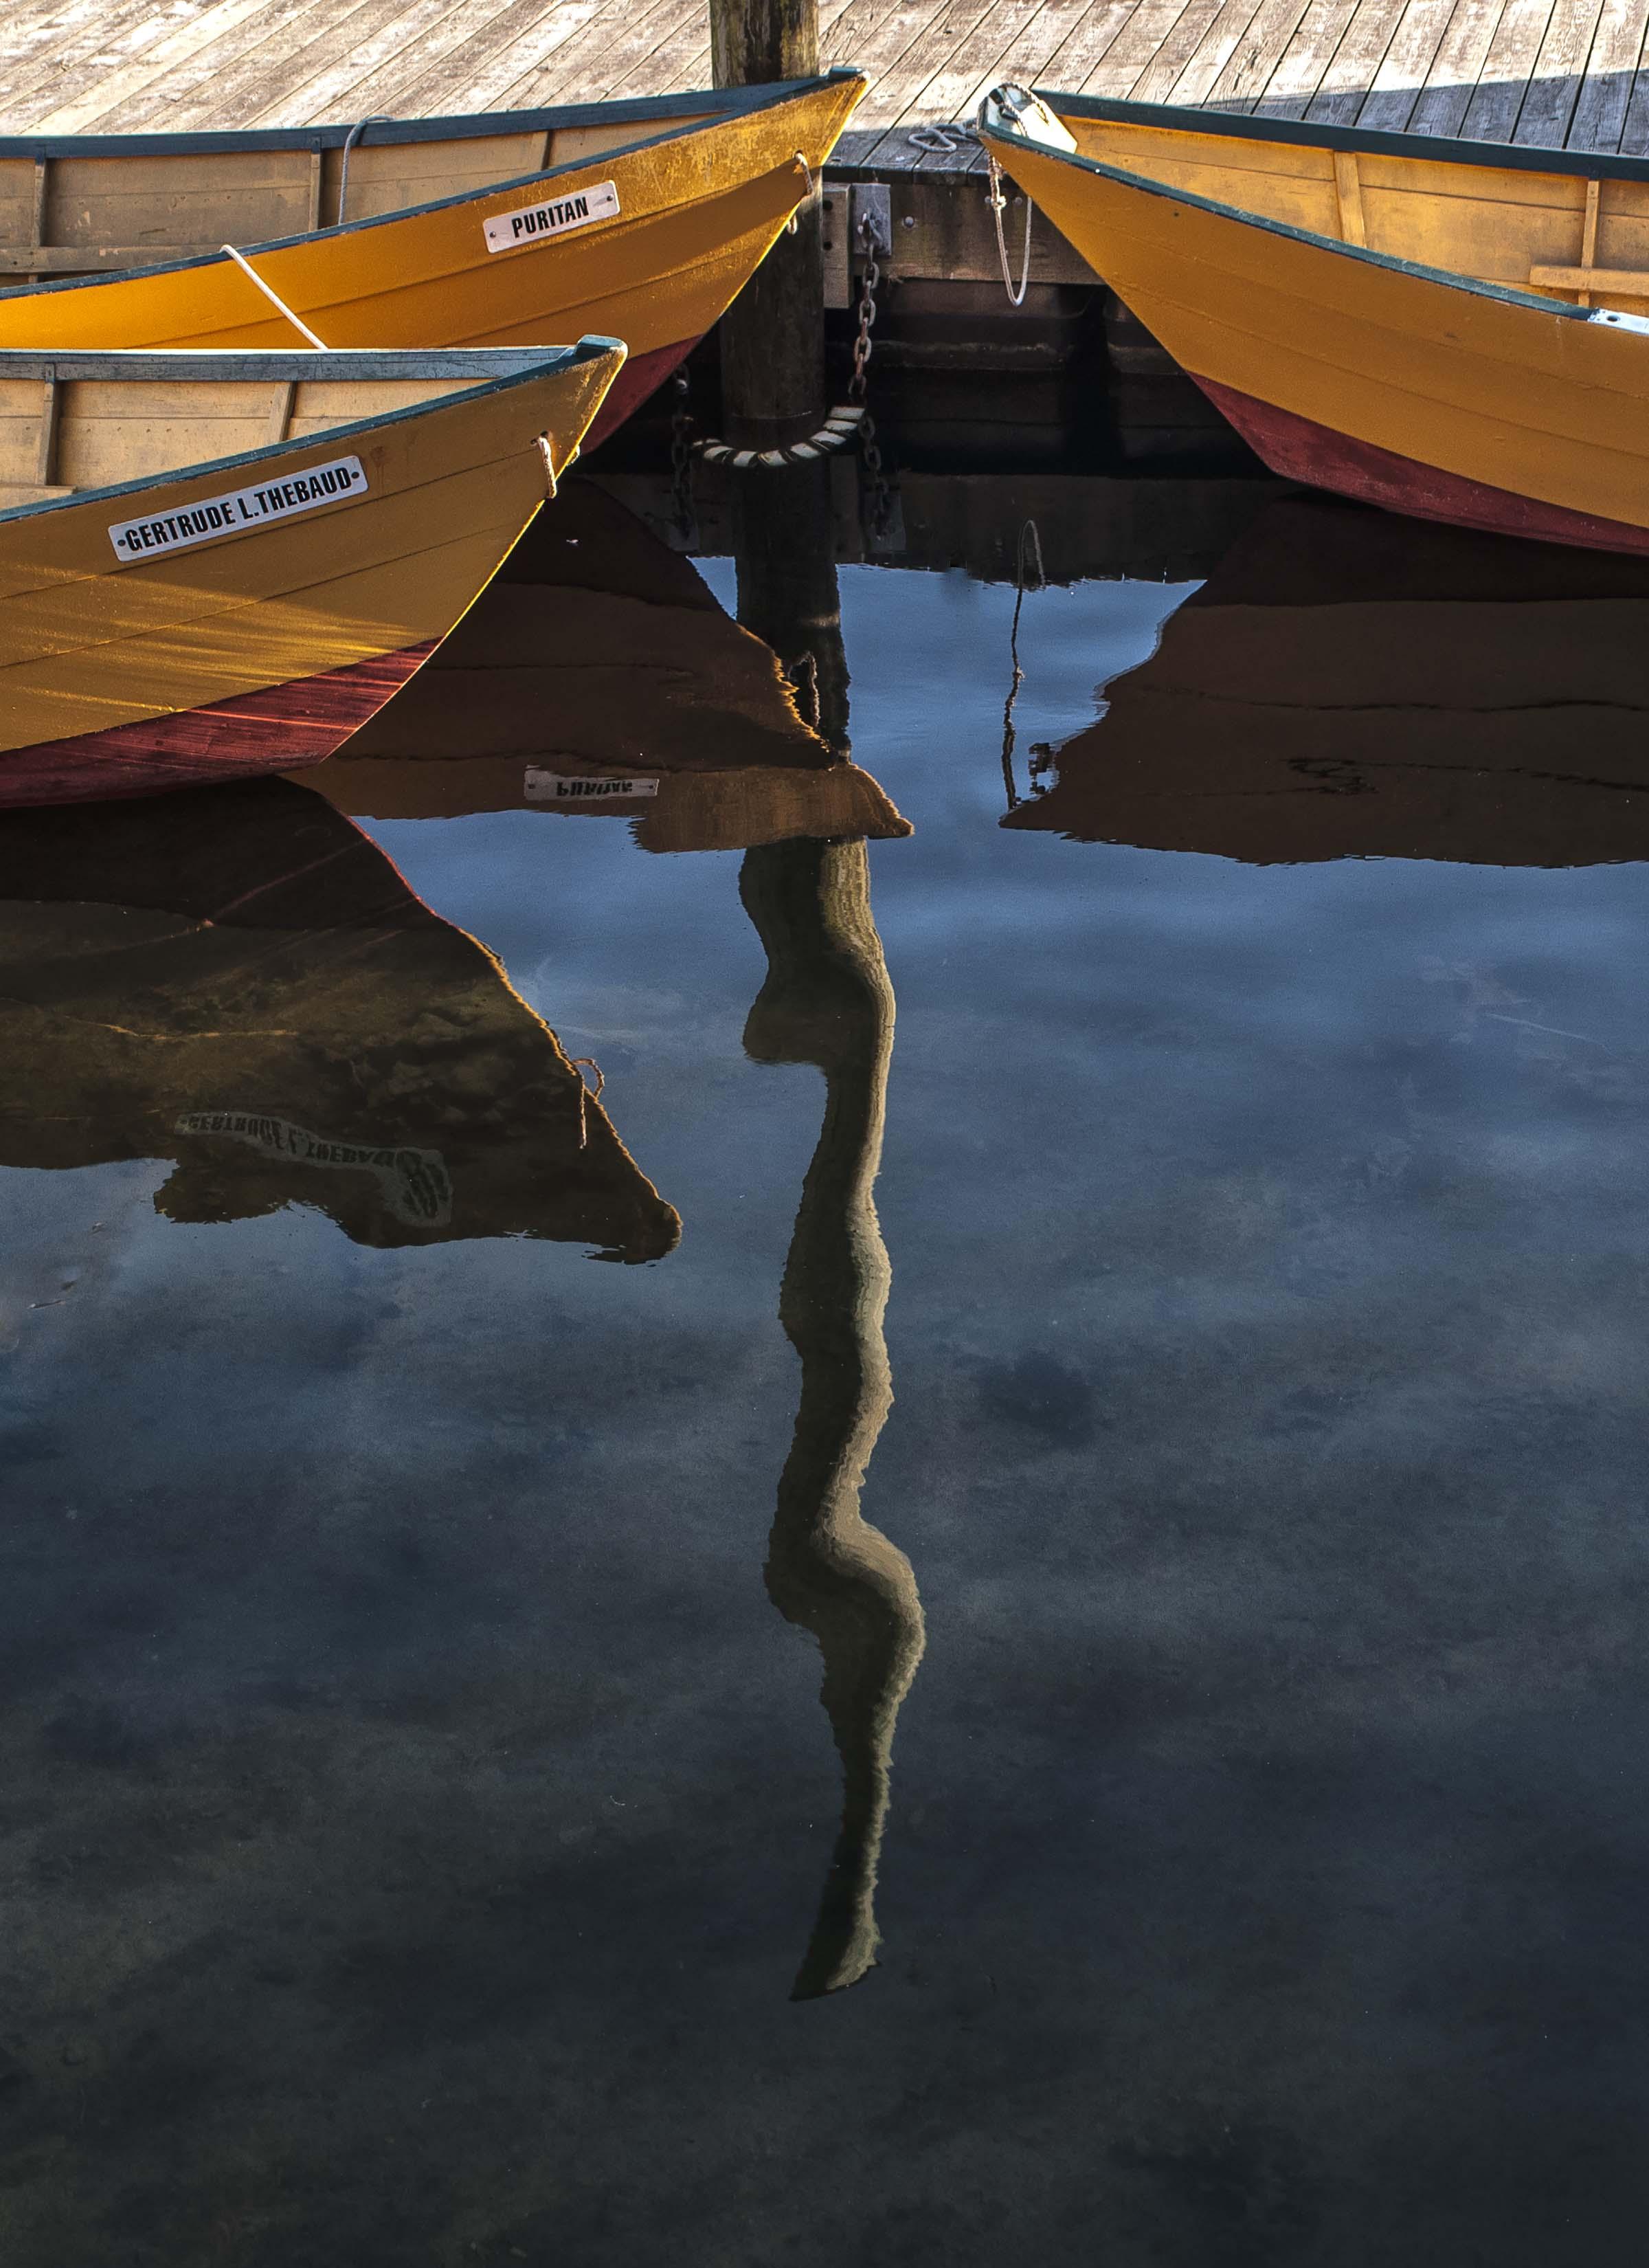 Rippling reflection